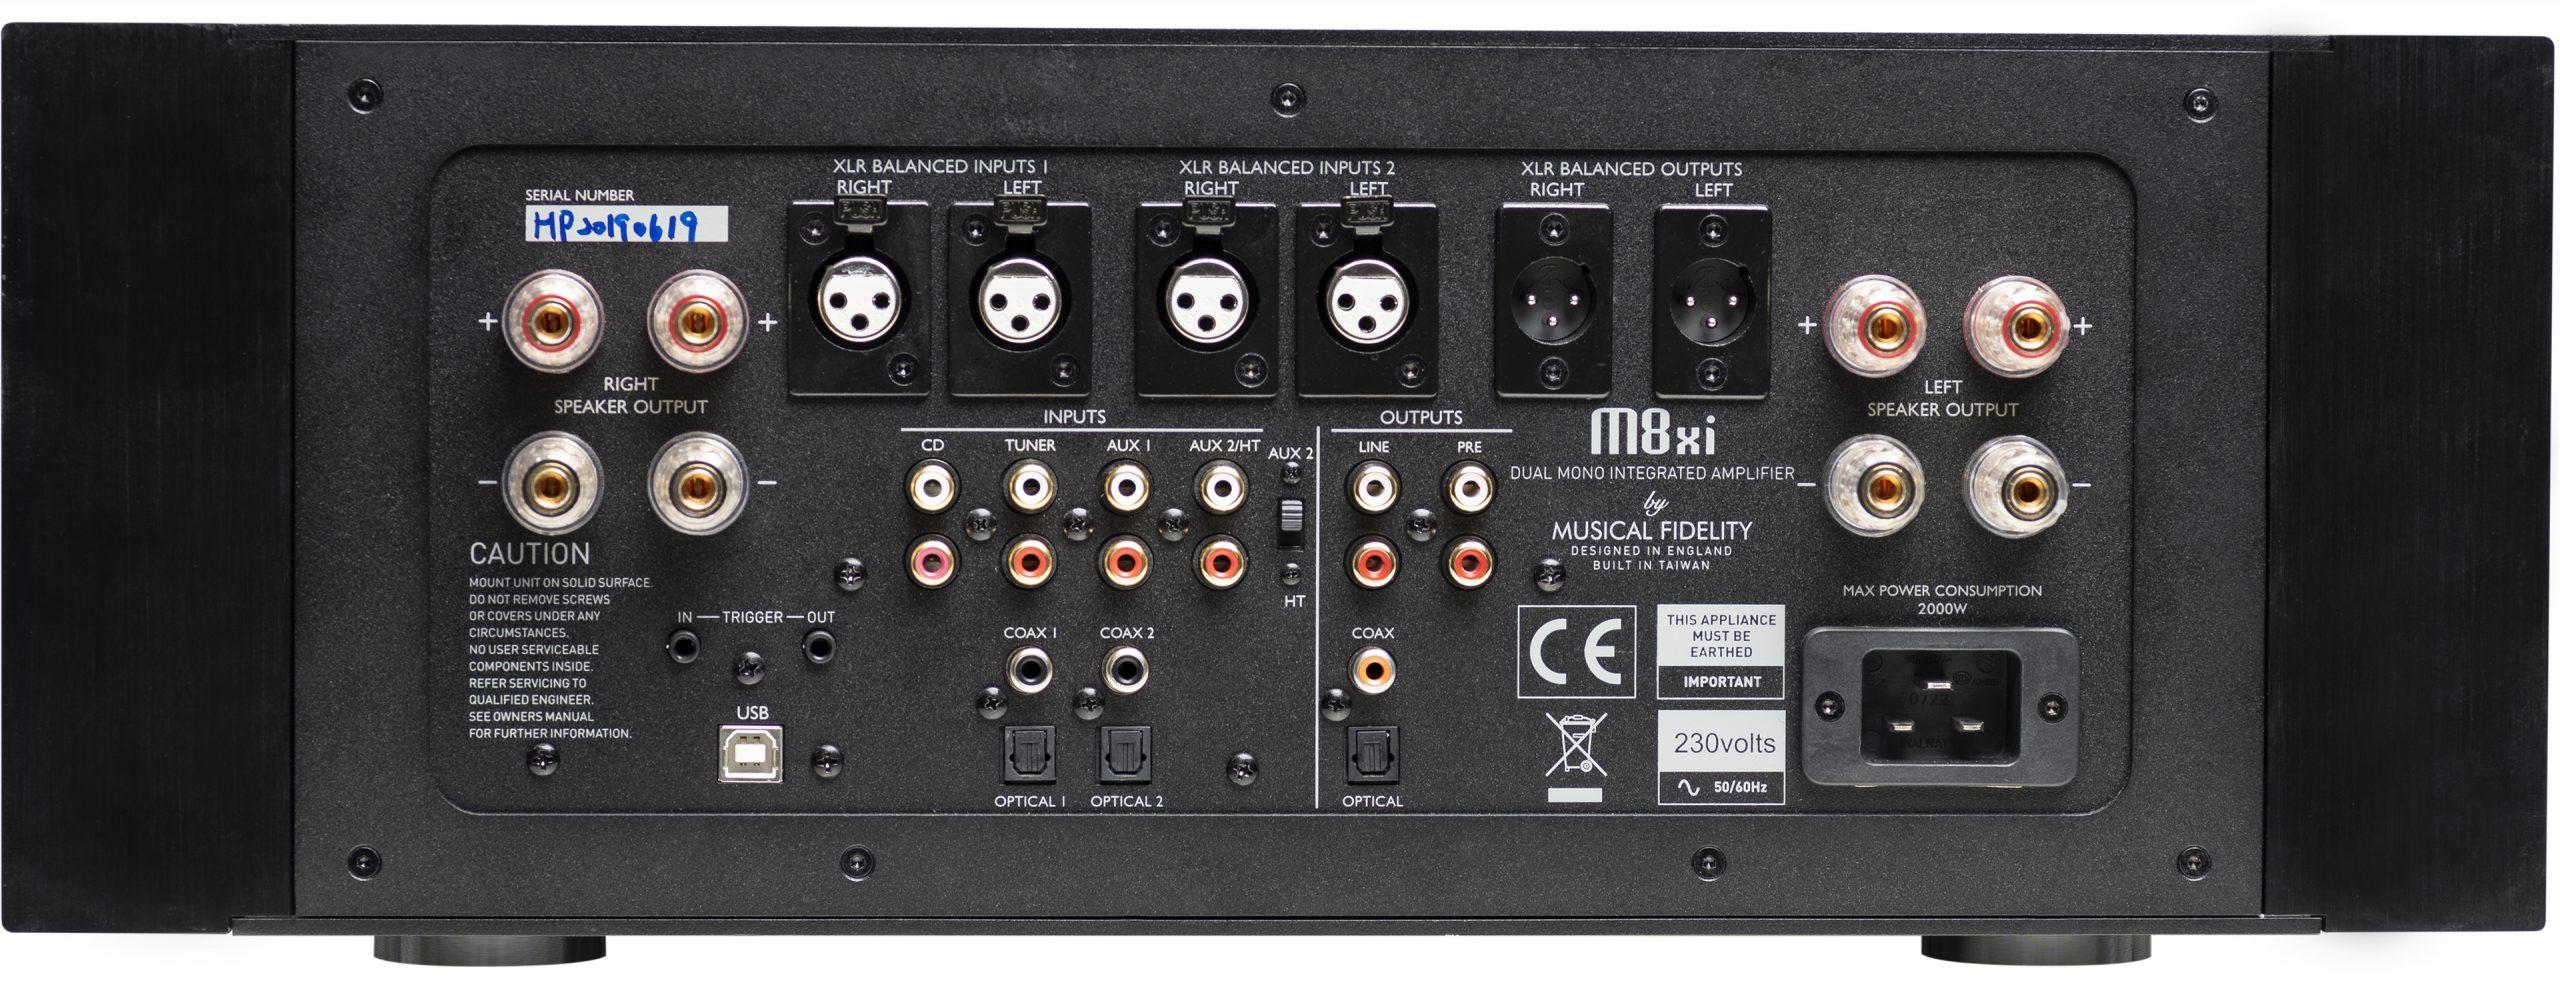 MF M8xi back cutout scaled 1 - Musical Fidelity M8xi